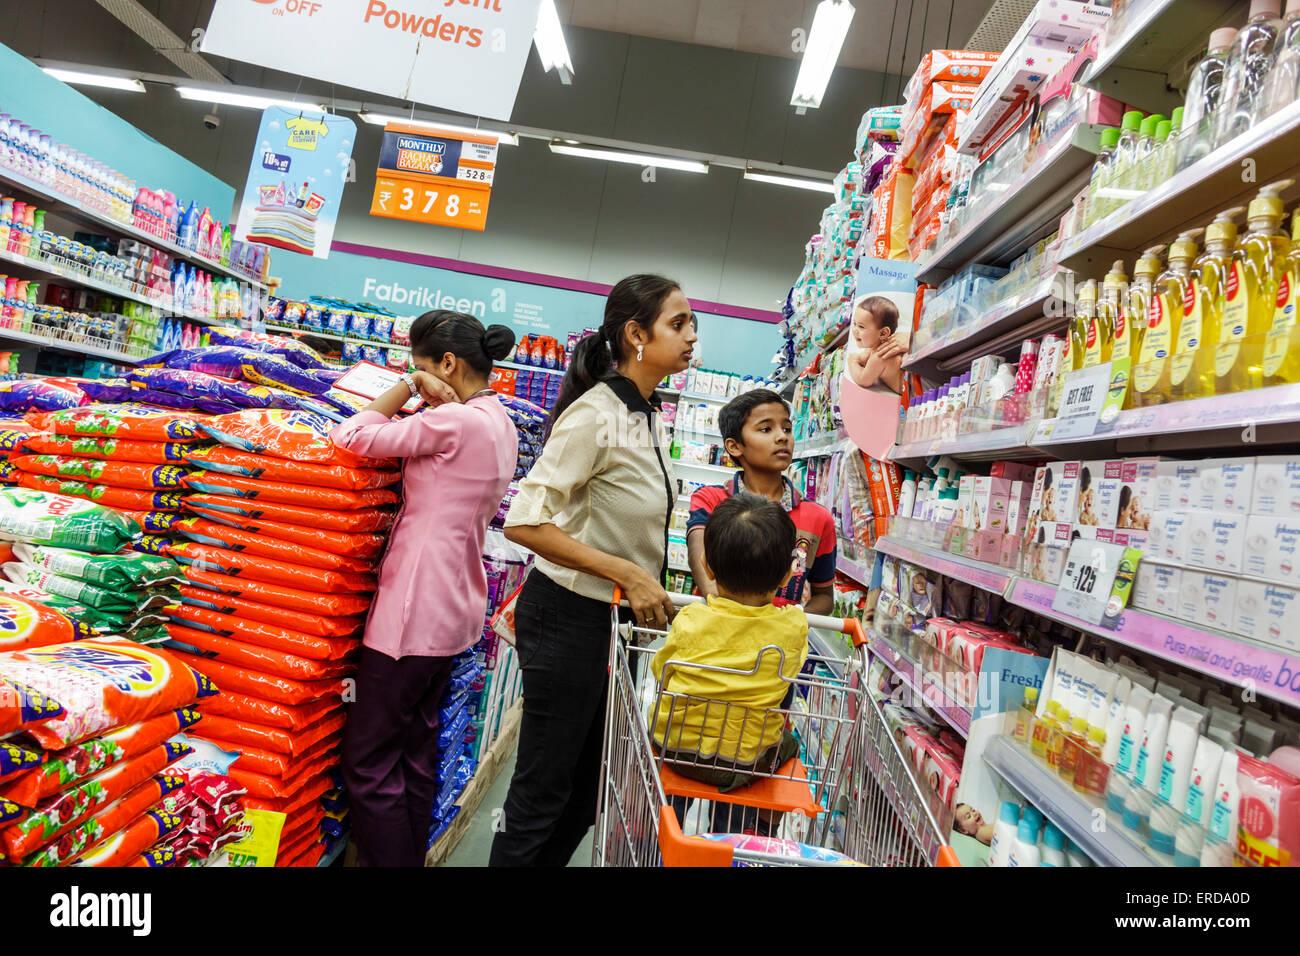 Mumbai India Asian Lower Parel High Street Phoenix mall inside shopping Big Bazaar supermarket grocery store sale - Stock Image